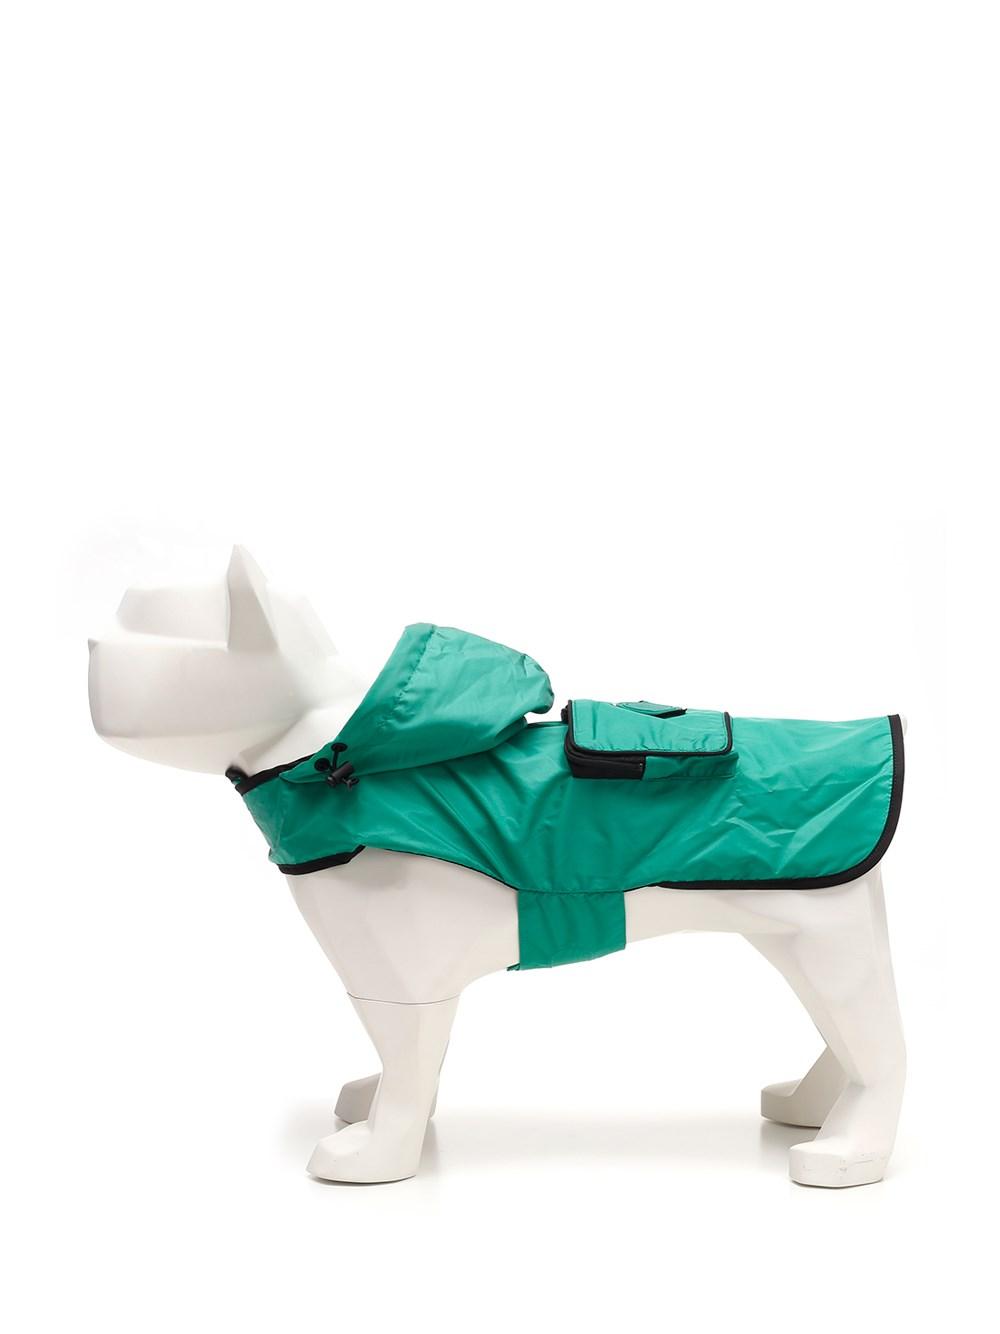 MONCLER POLDO Dog Windbreaker